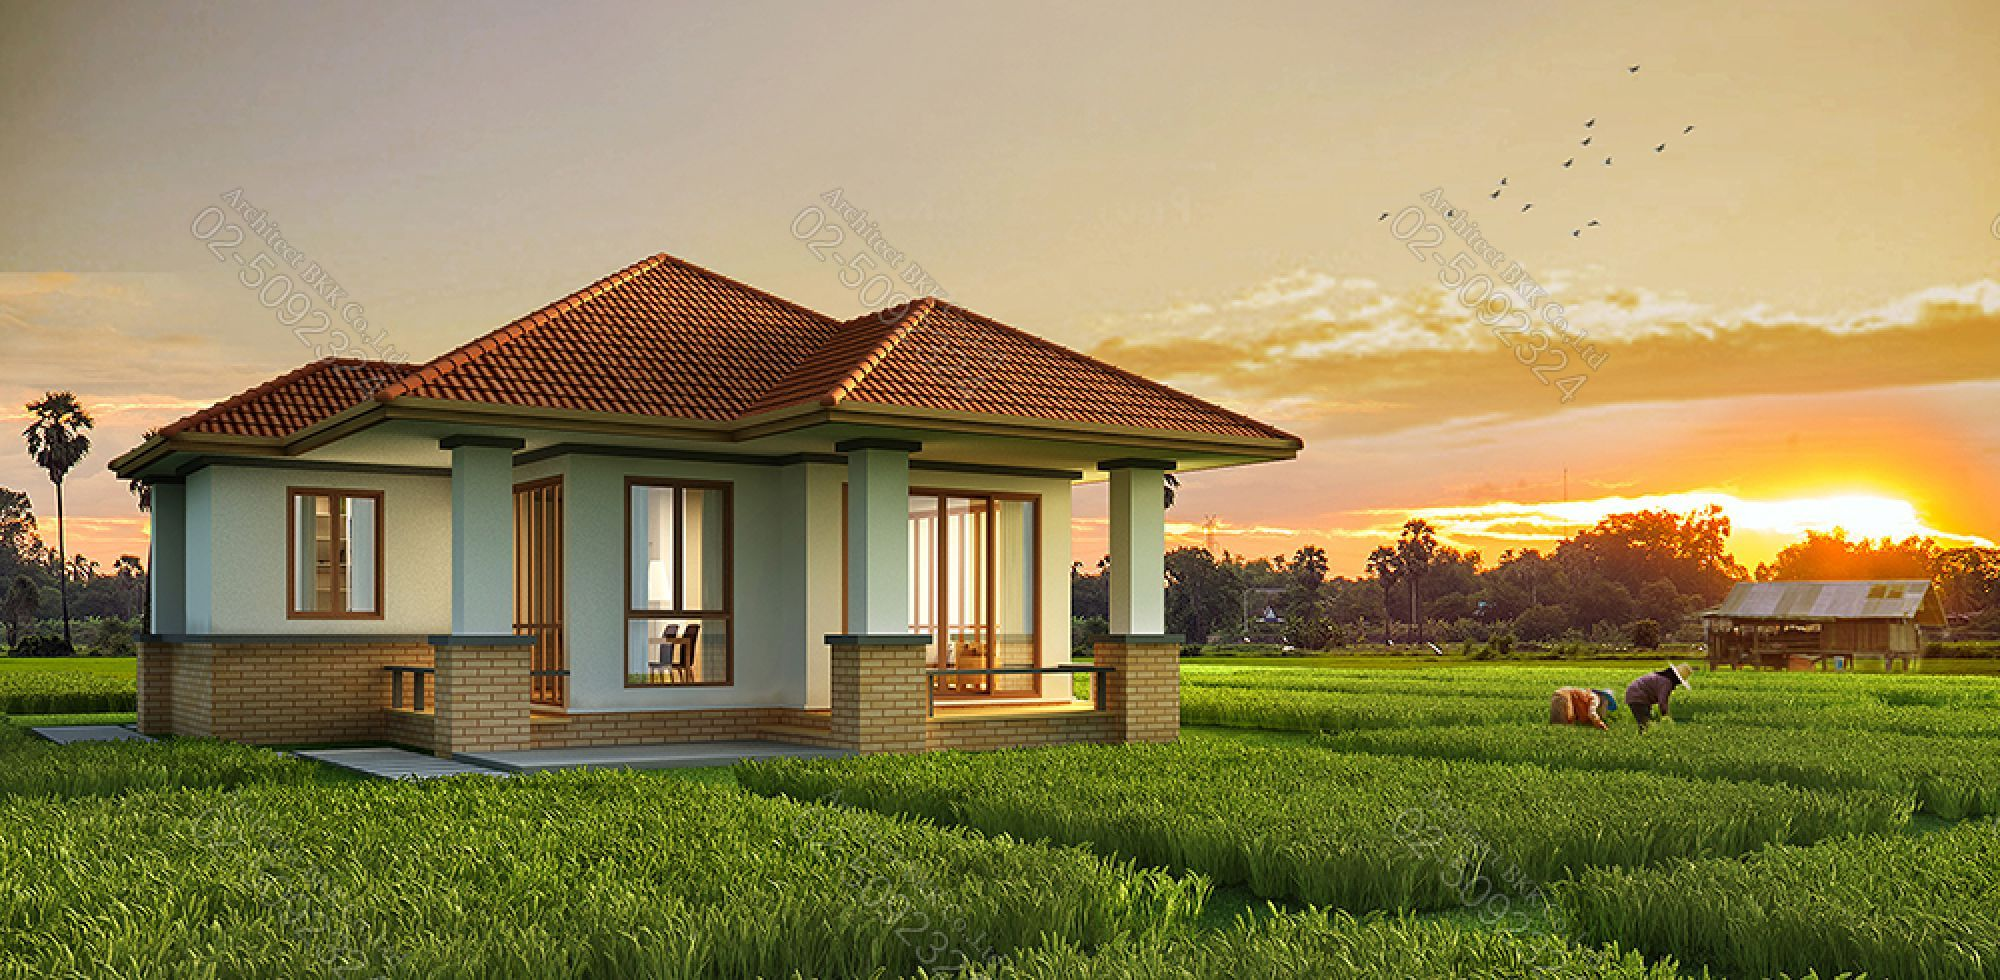 3d House Plans 1st Floor For Construction Thailand 3d House Plans House Plan Gallery House Plans